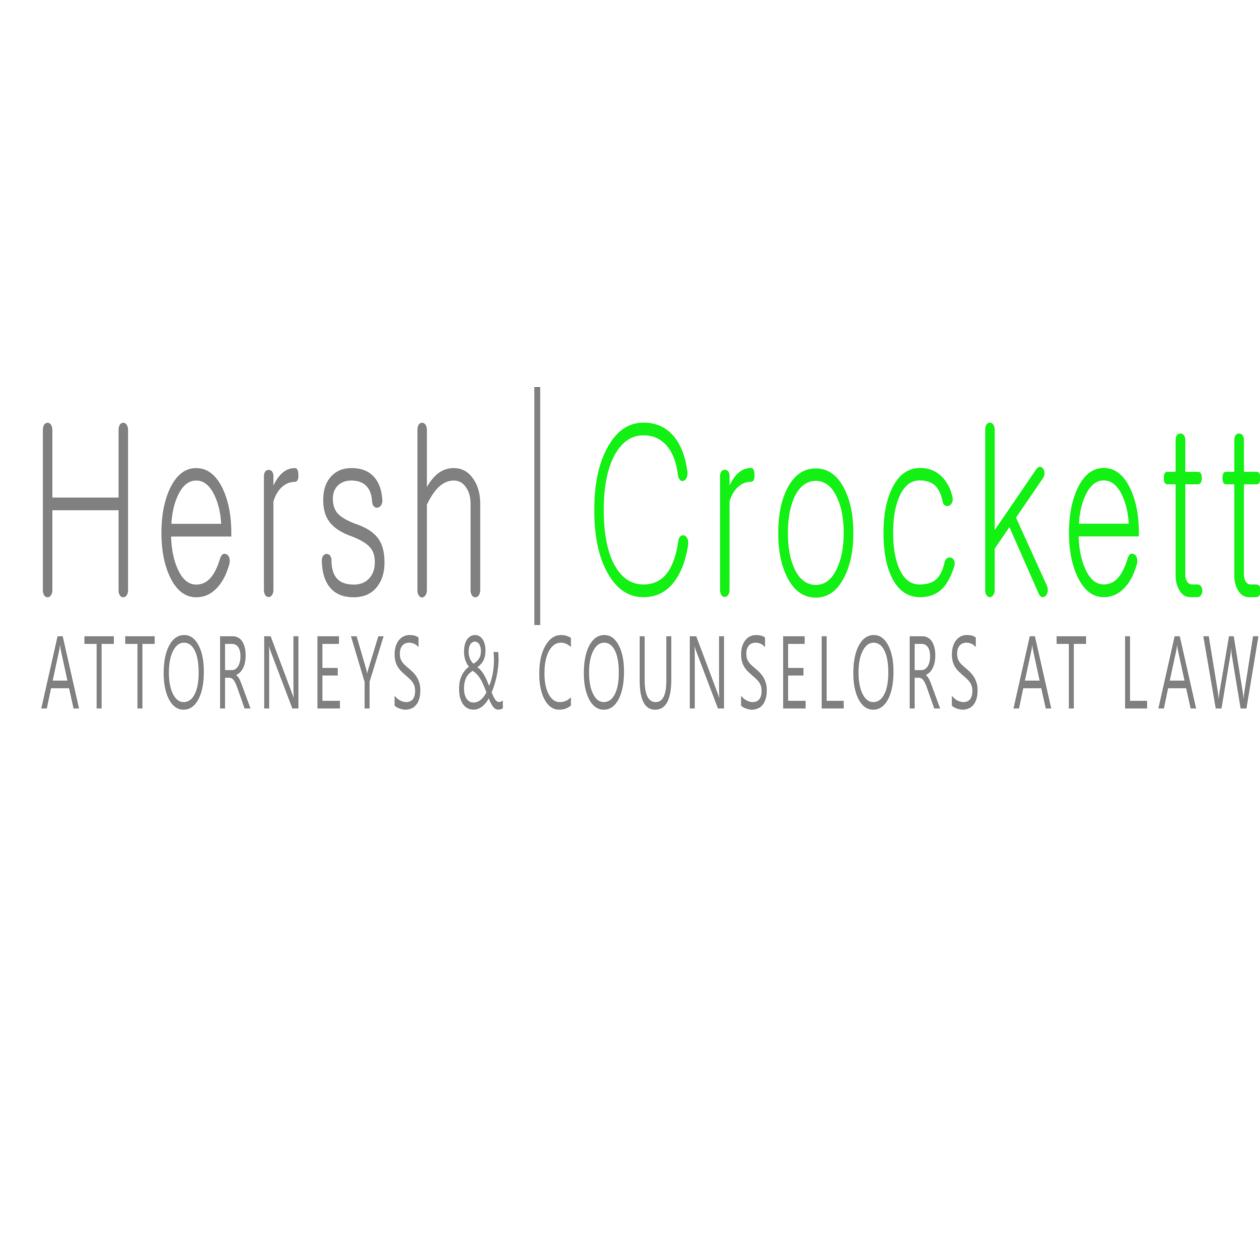 Hersh | Crockett Attorneys & Counselors at Law